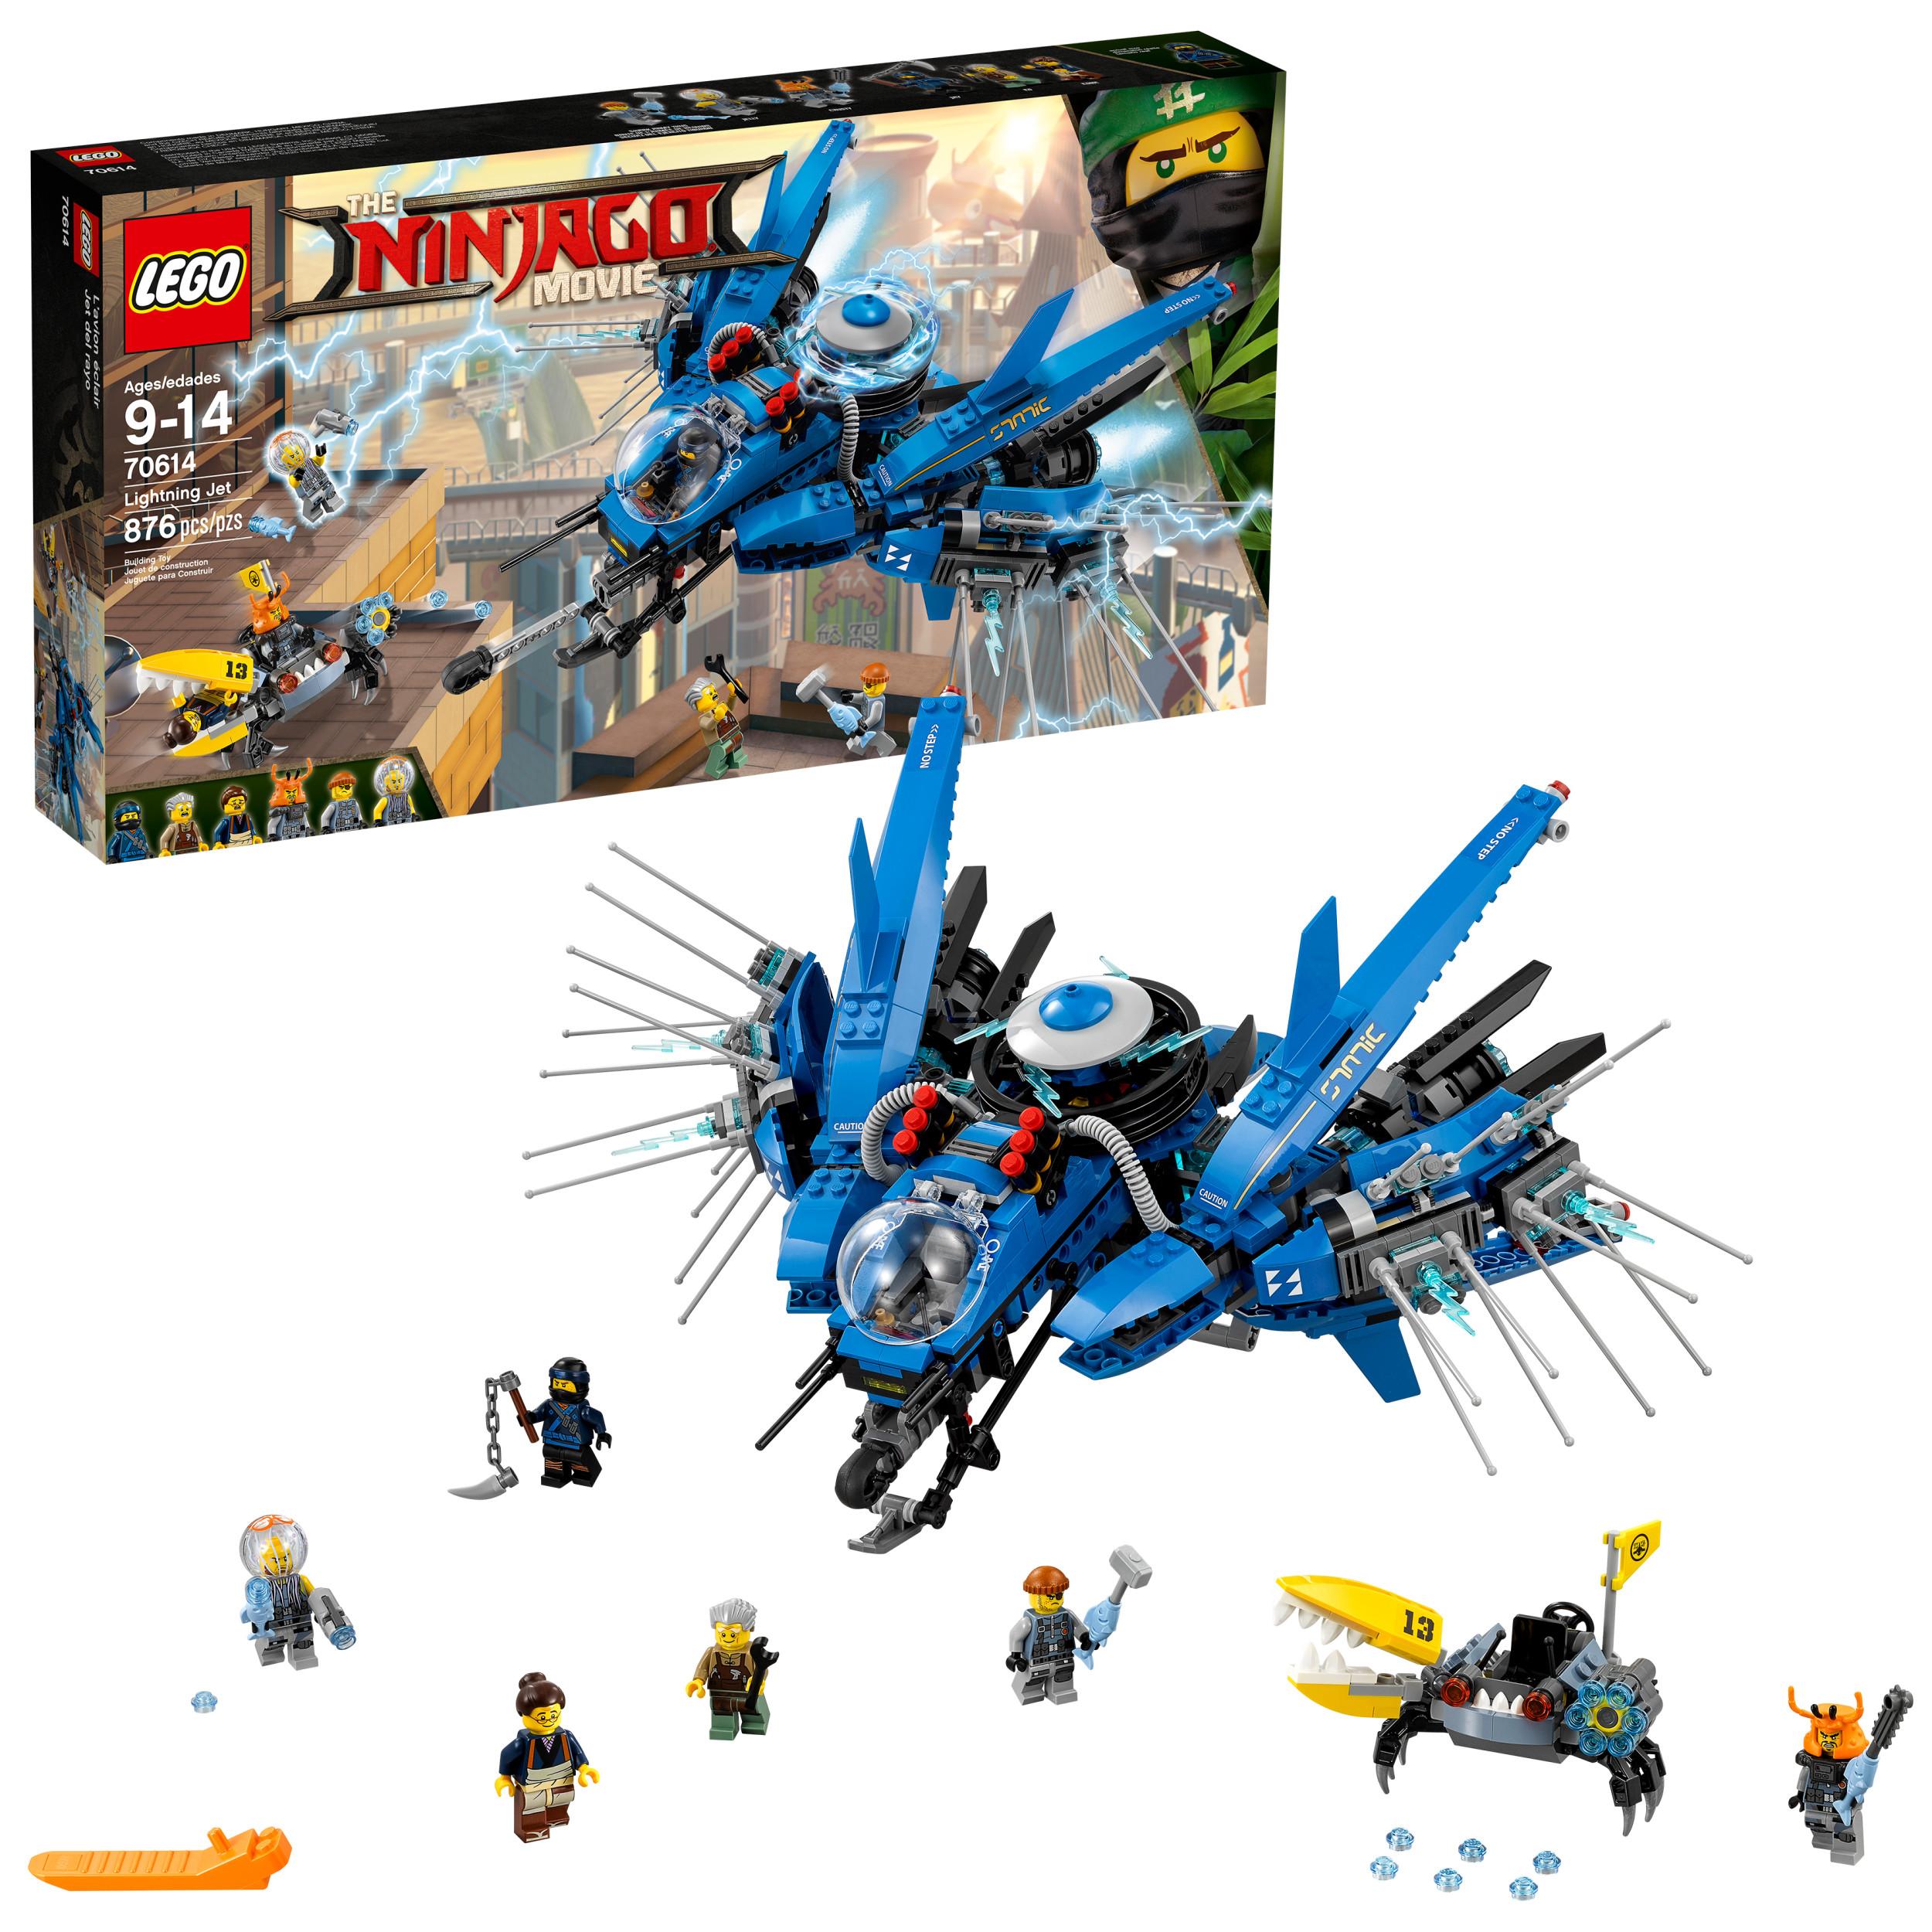 LEGO Ninjago Movie Lightning Jet 70614 (876 Pieces)